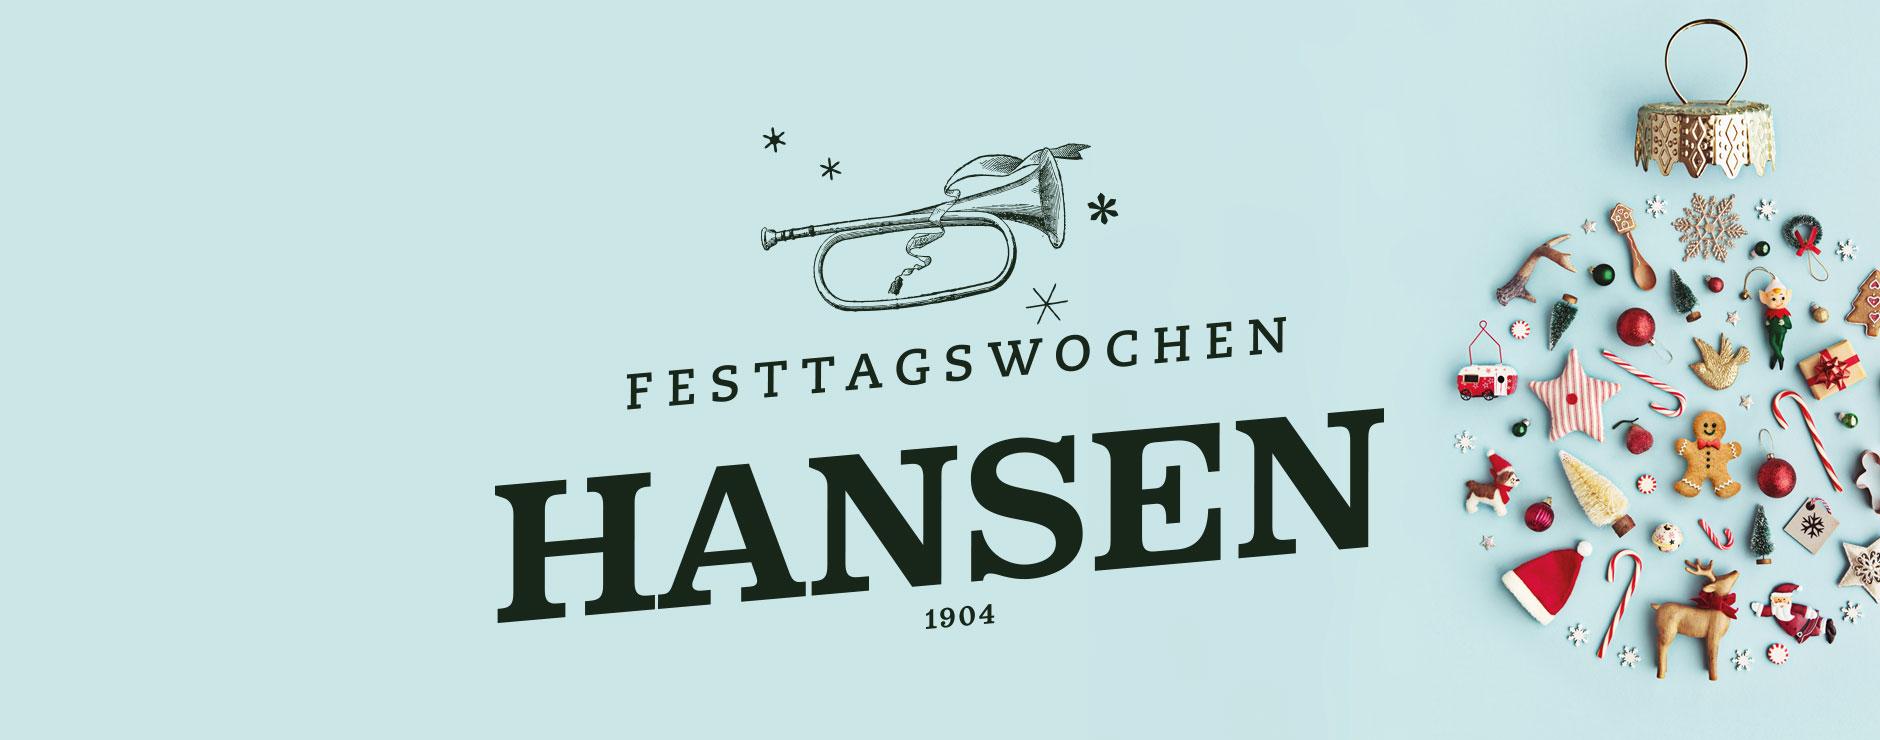 web-titel-festtasgsfreuden2018